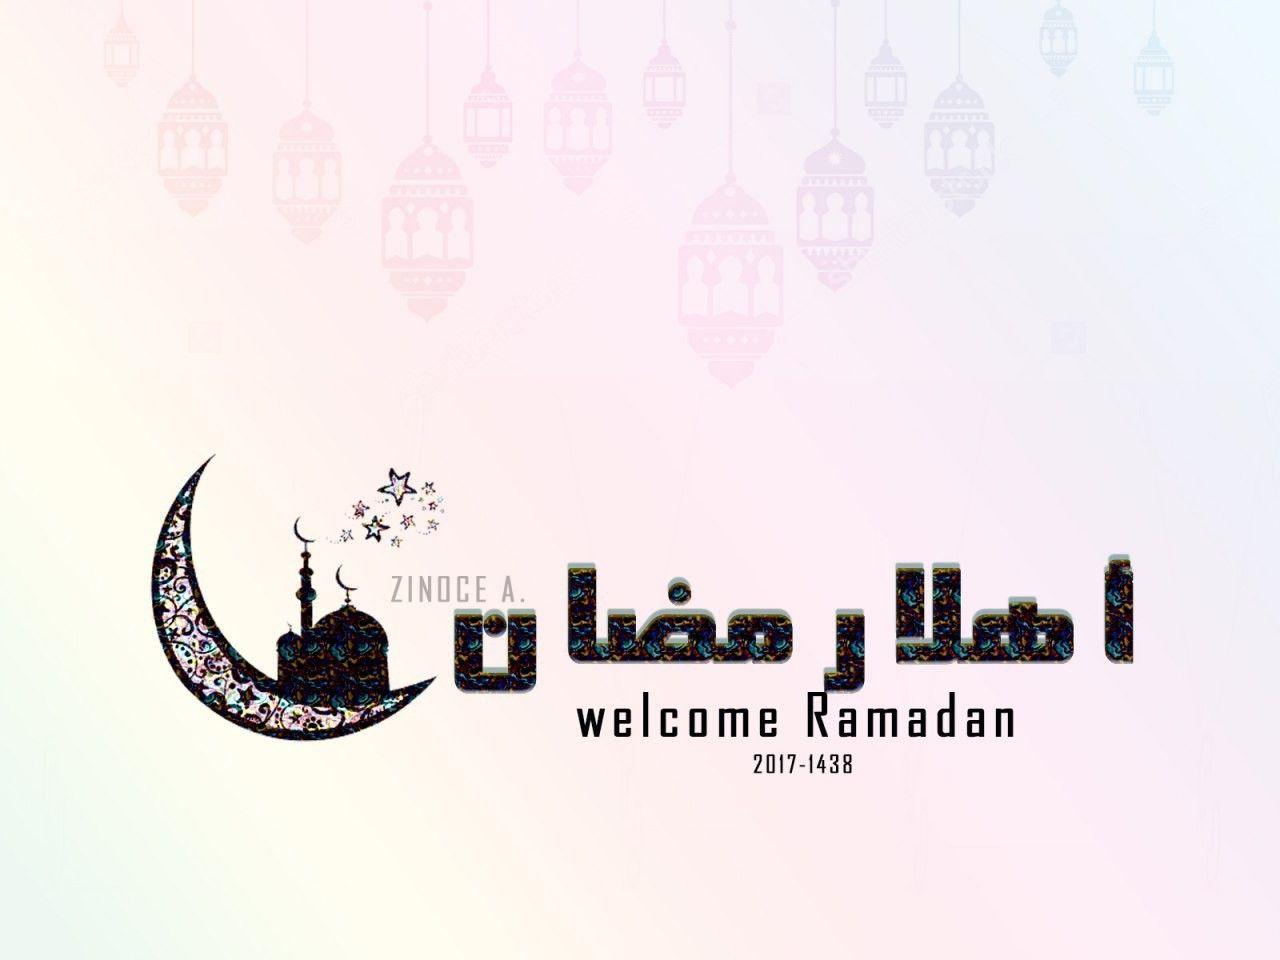 اهلا رمضان Ramadan Ramadan2017 رمضان كريم Ramadan Home Decor Decals Poster